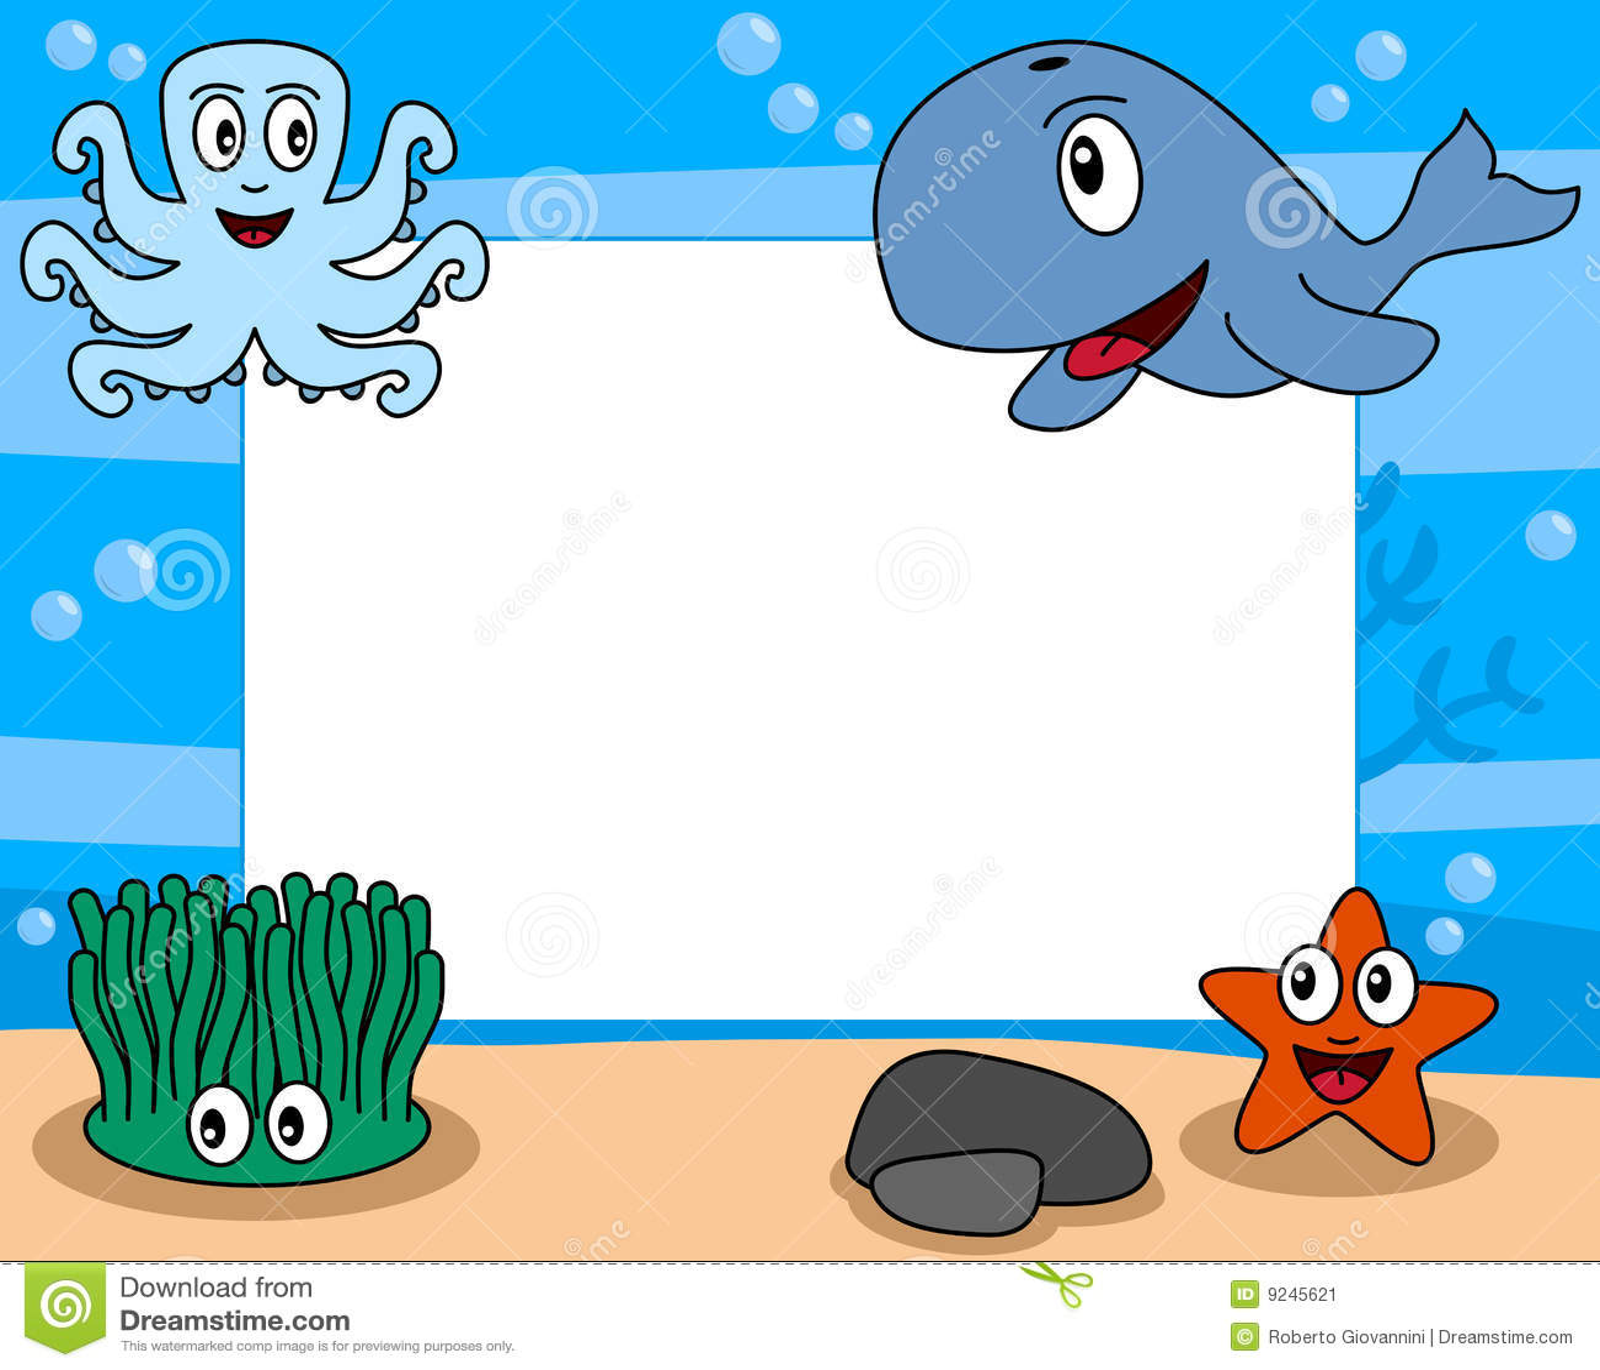 Sea Life Photo Frame [2] Illustration 9245621 - Megapixl